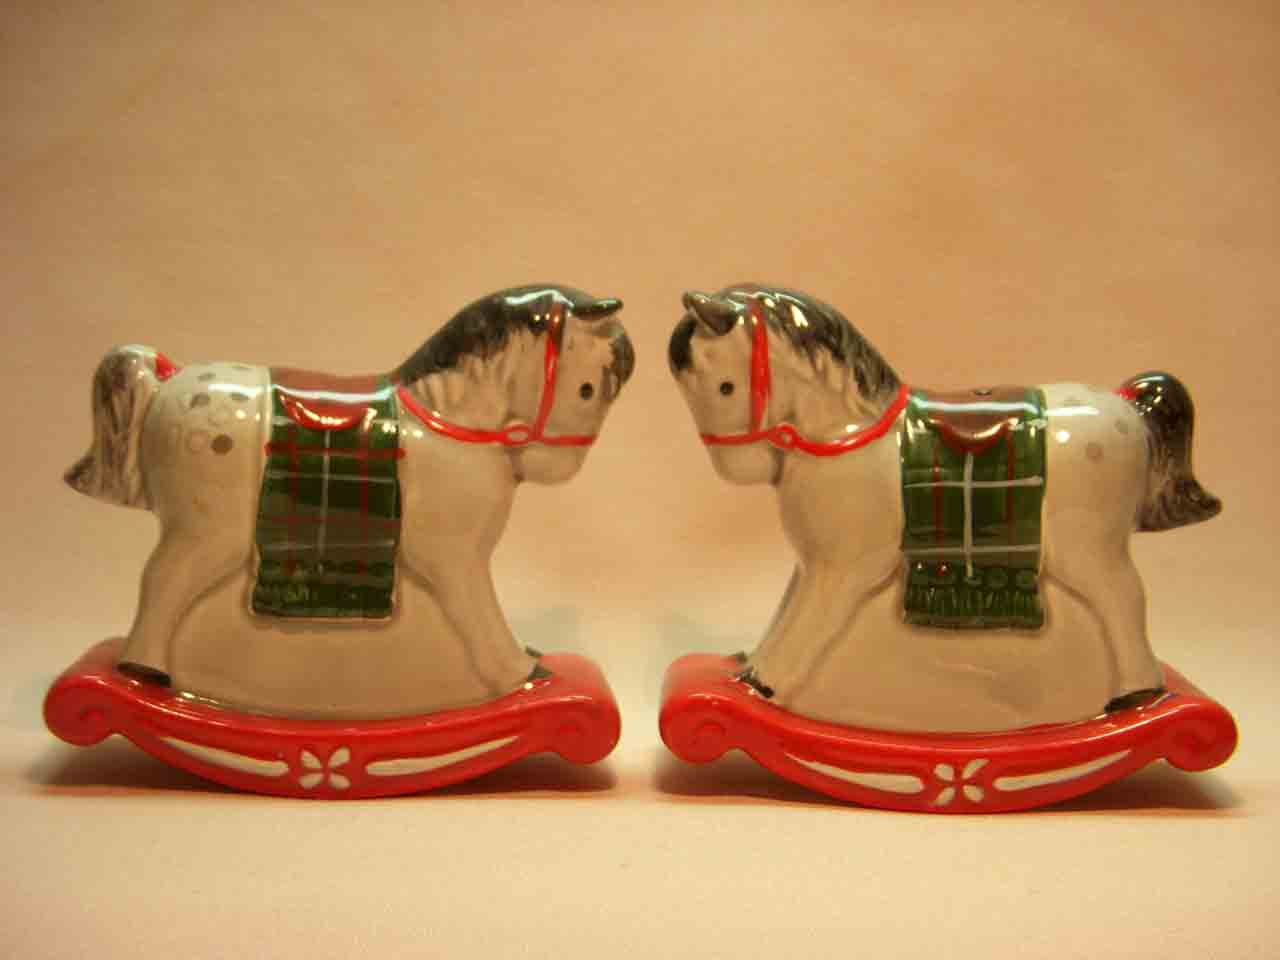 Josef Originals rocking horses salt and pepper shaker